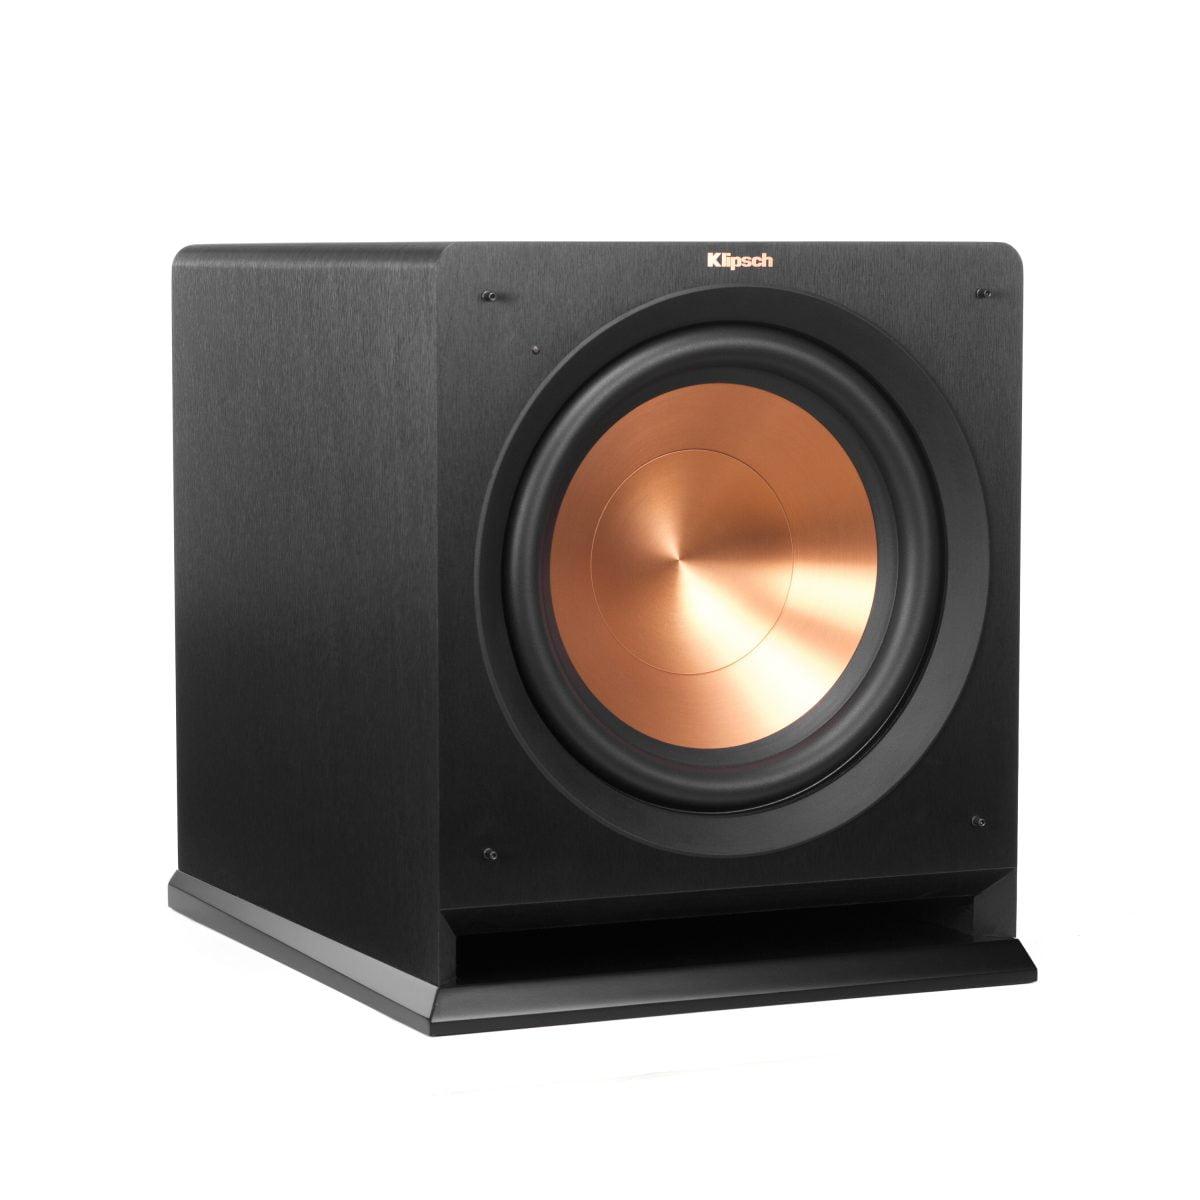 klipsch powered speakers. klipsch rp-112sw powered speakers h